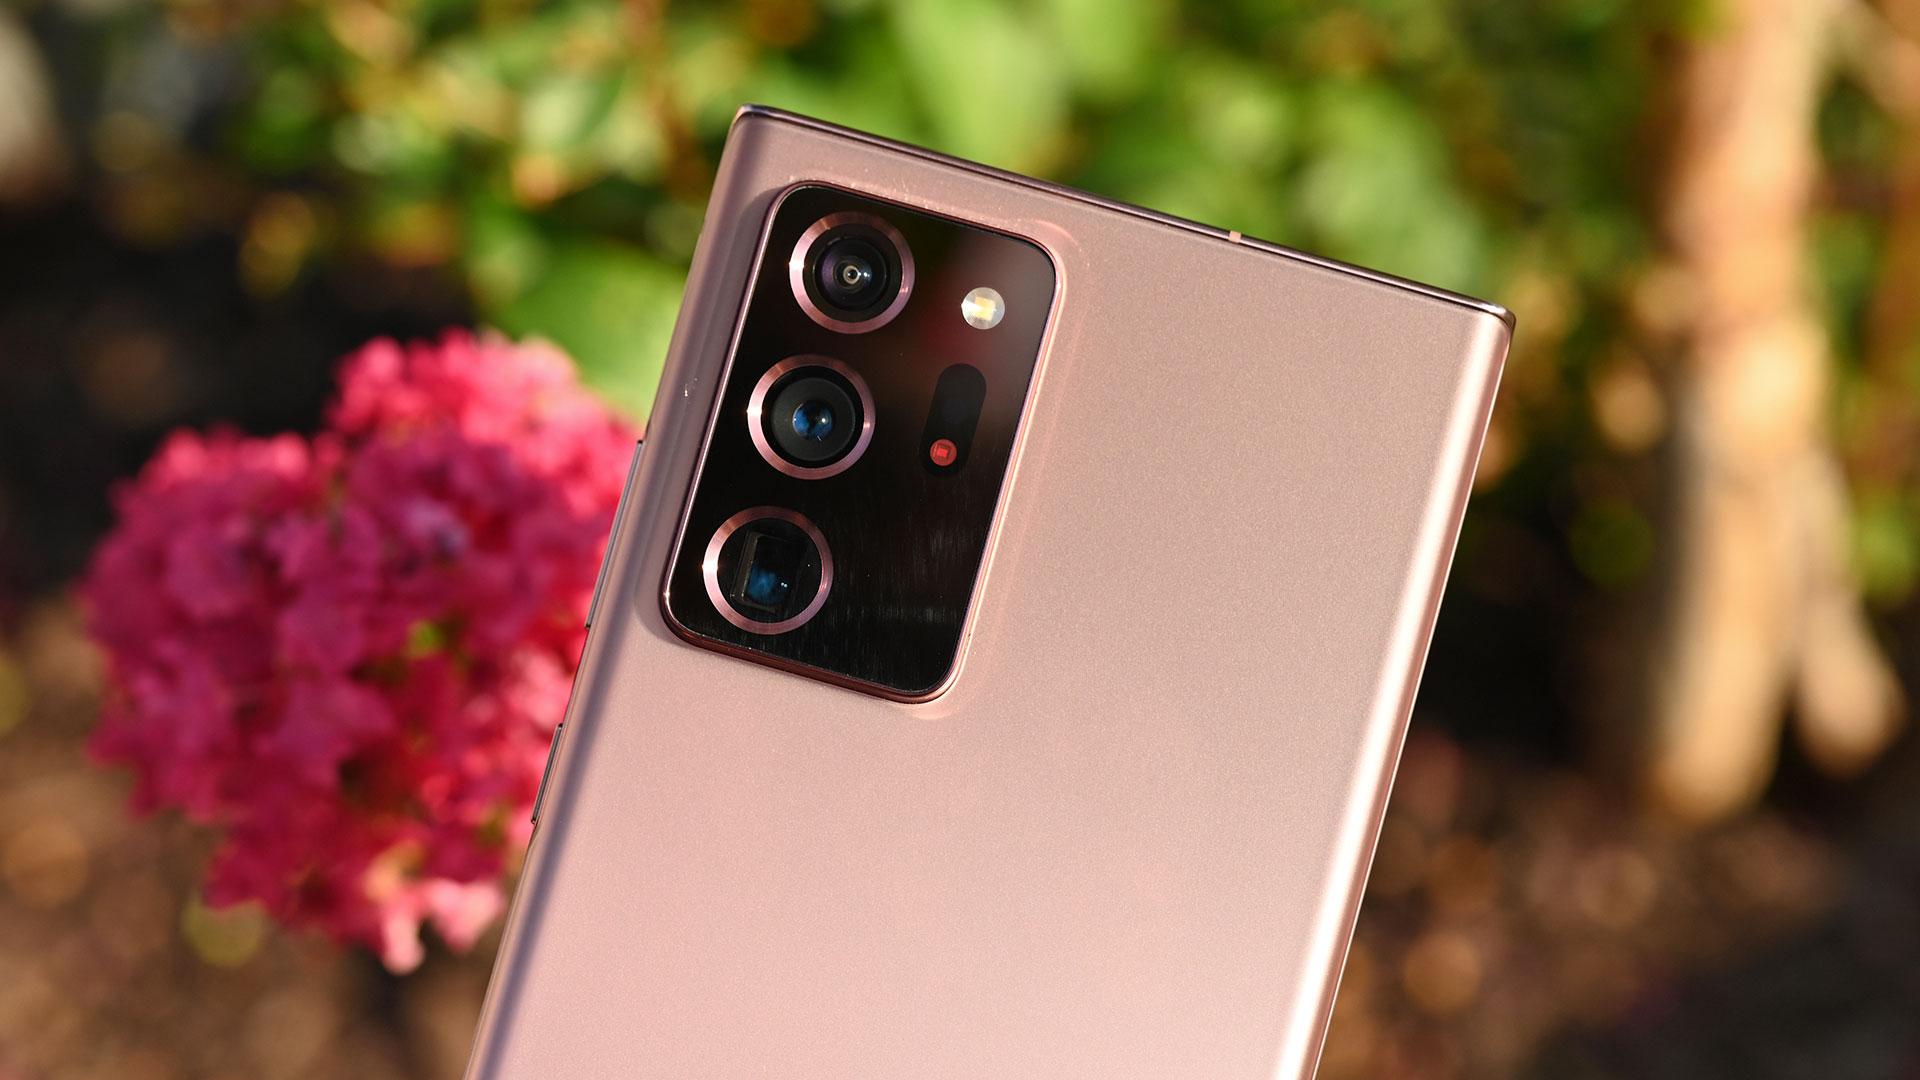 Câmeras traseiras do Galaxy Note 20 Ultra. Crédito: Sam Rutherford/Gizmodo